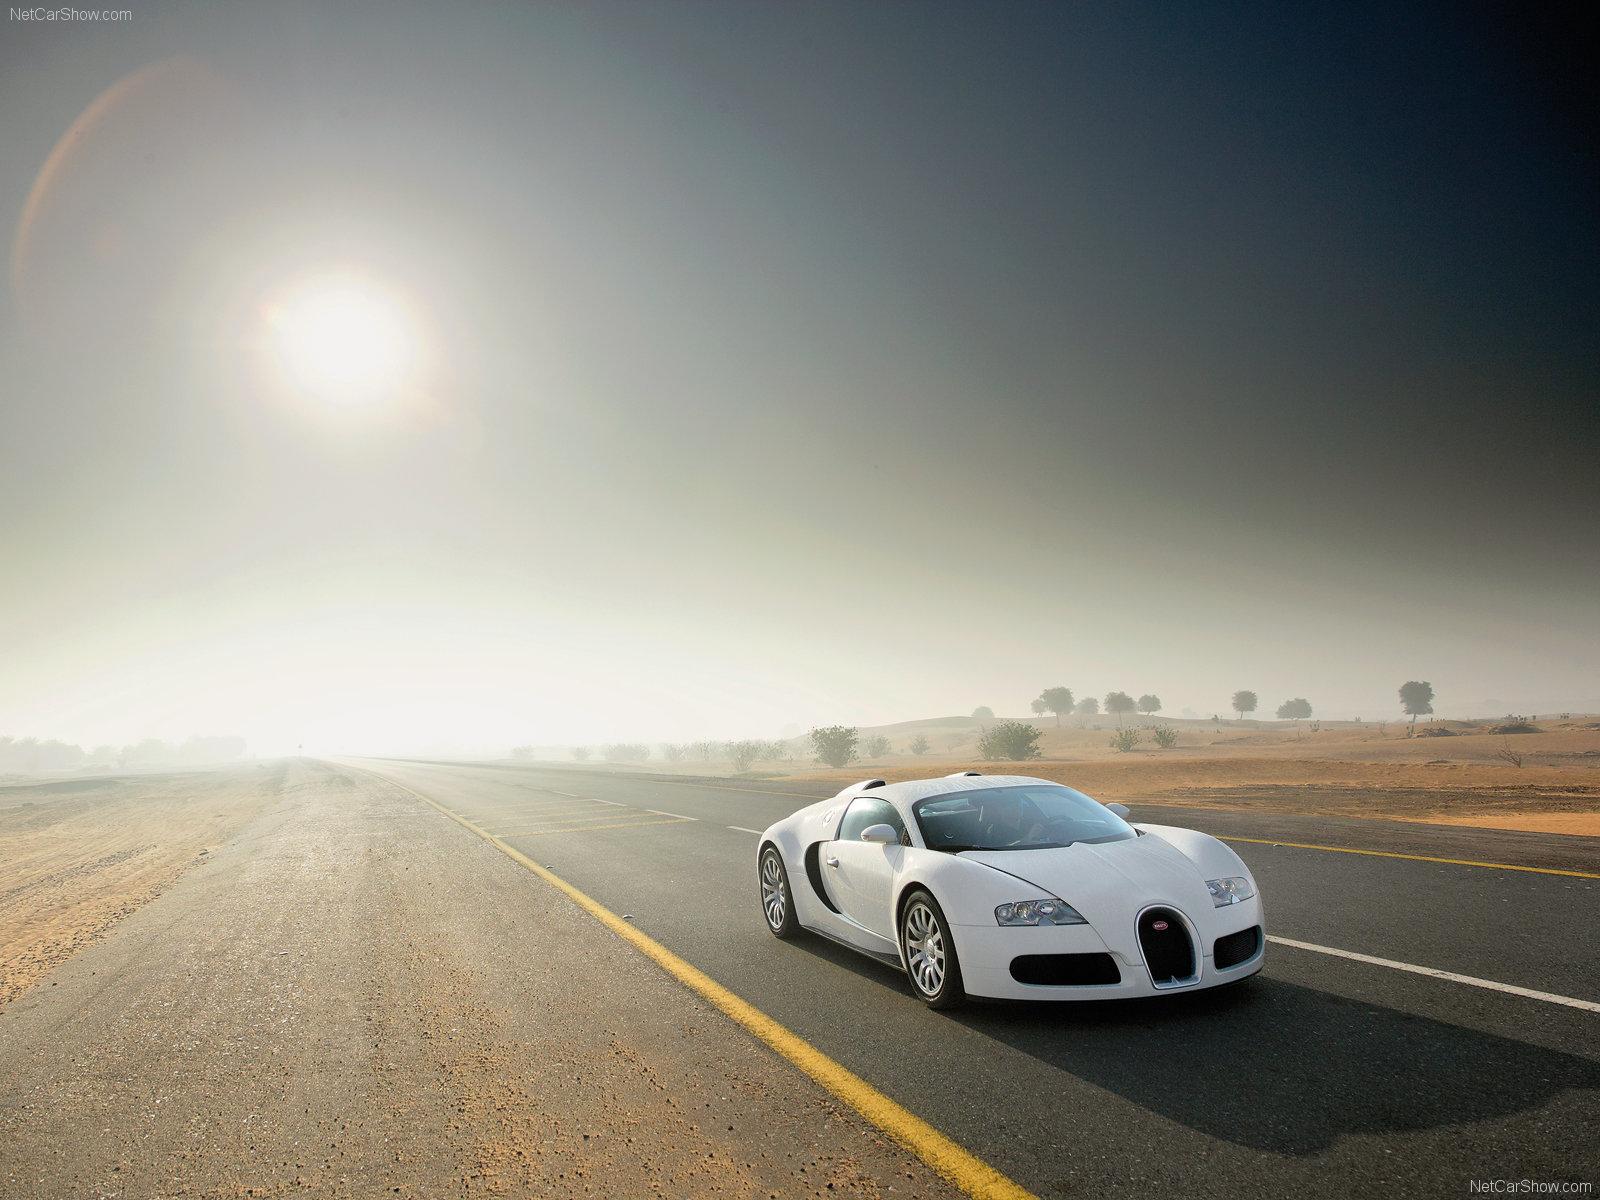 8159 скачать обои Транспорт, Машины, Дороги, Бугатти (Bugatti) - заставки и картинки бесплатно